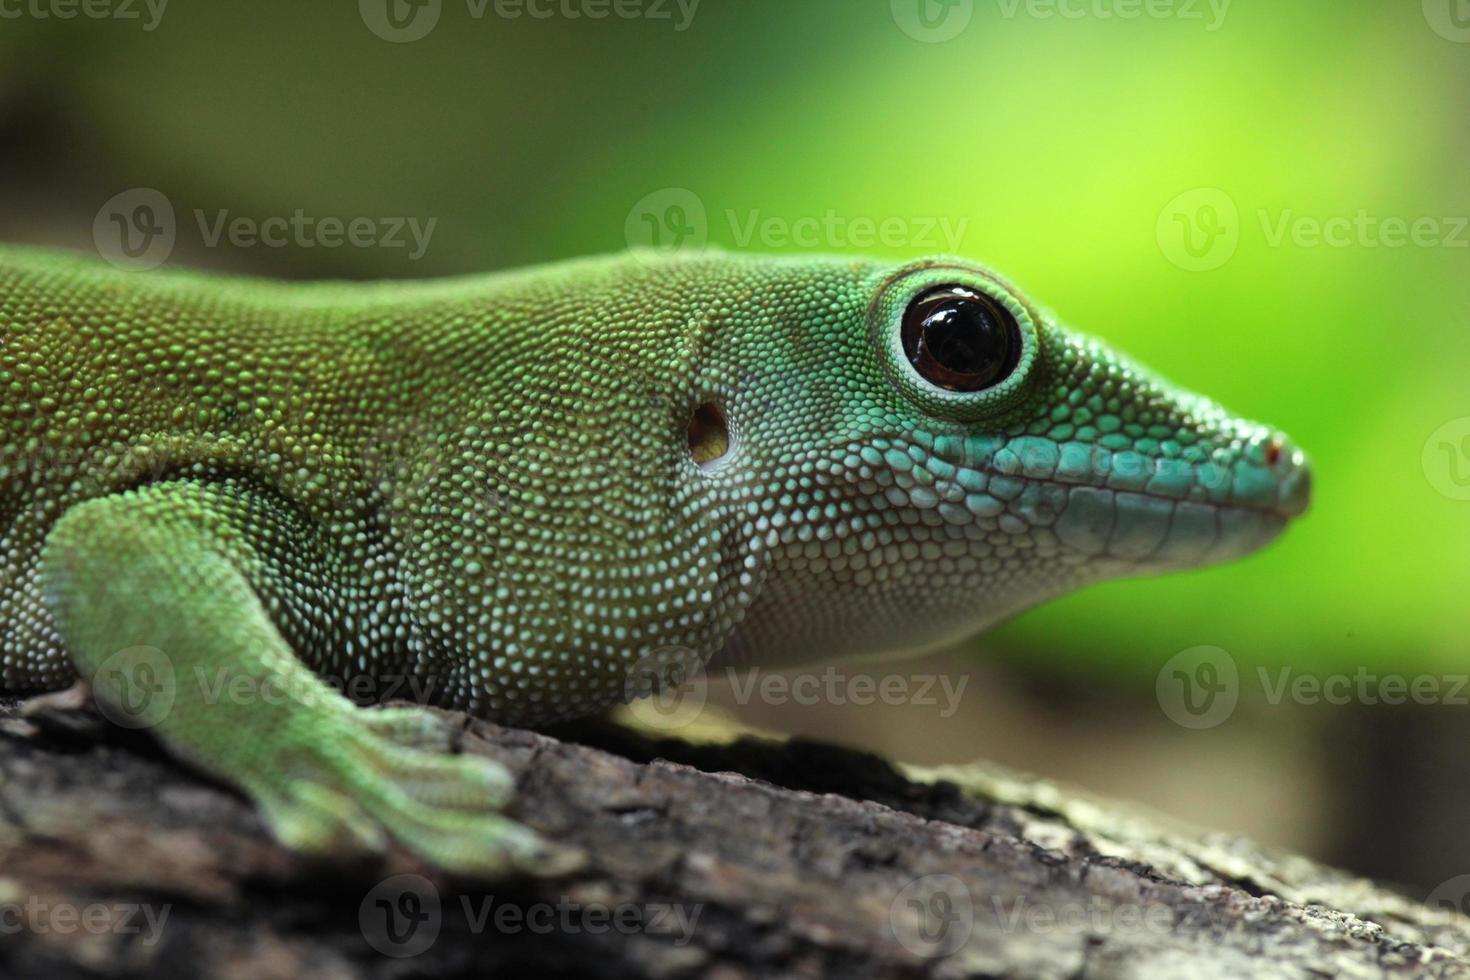 Kochs Riesen-Tagesgecko (Phelsuma Madagascariensis Kochi). foto